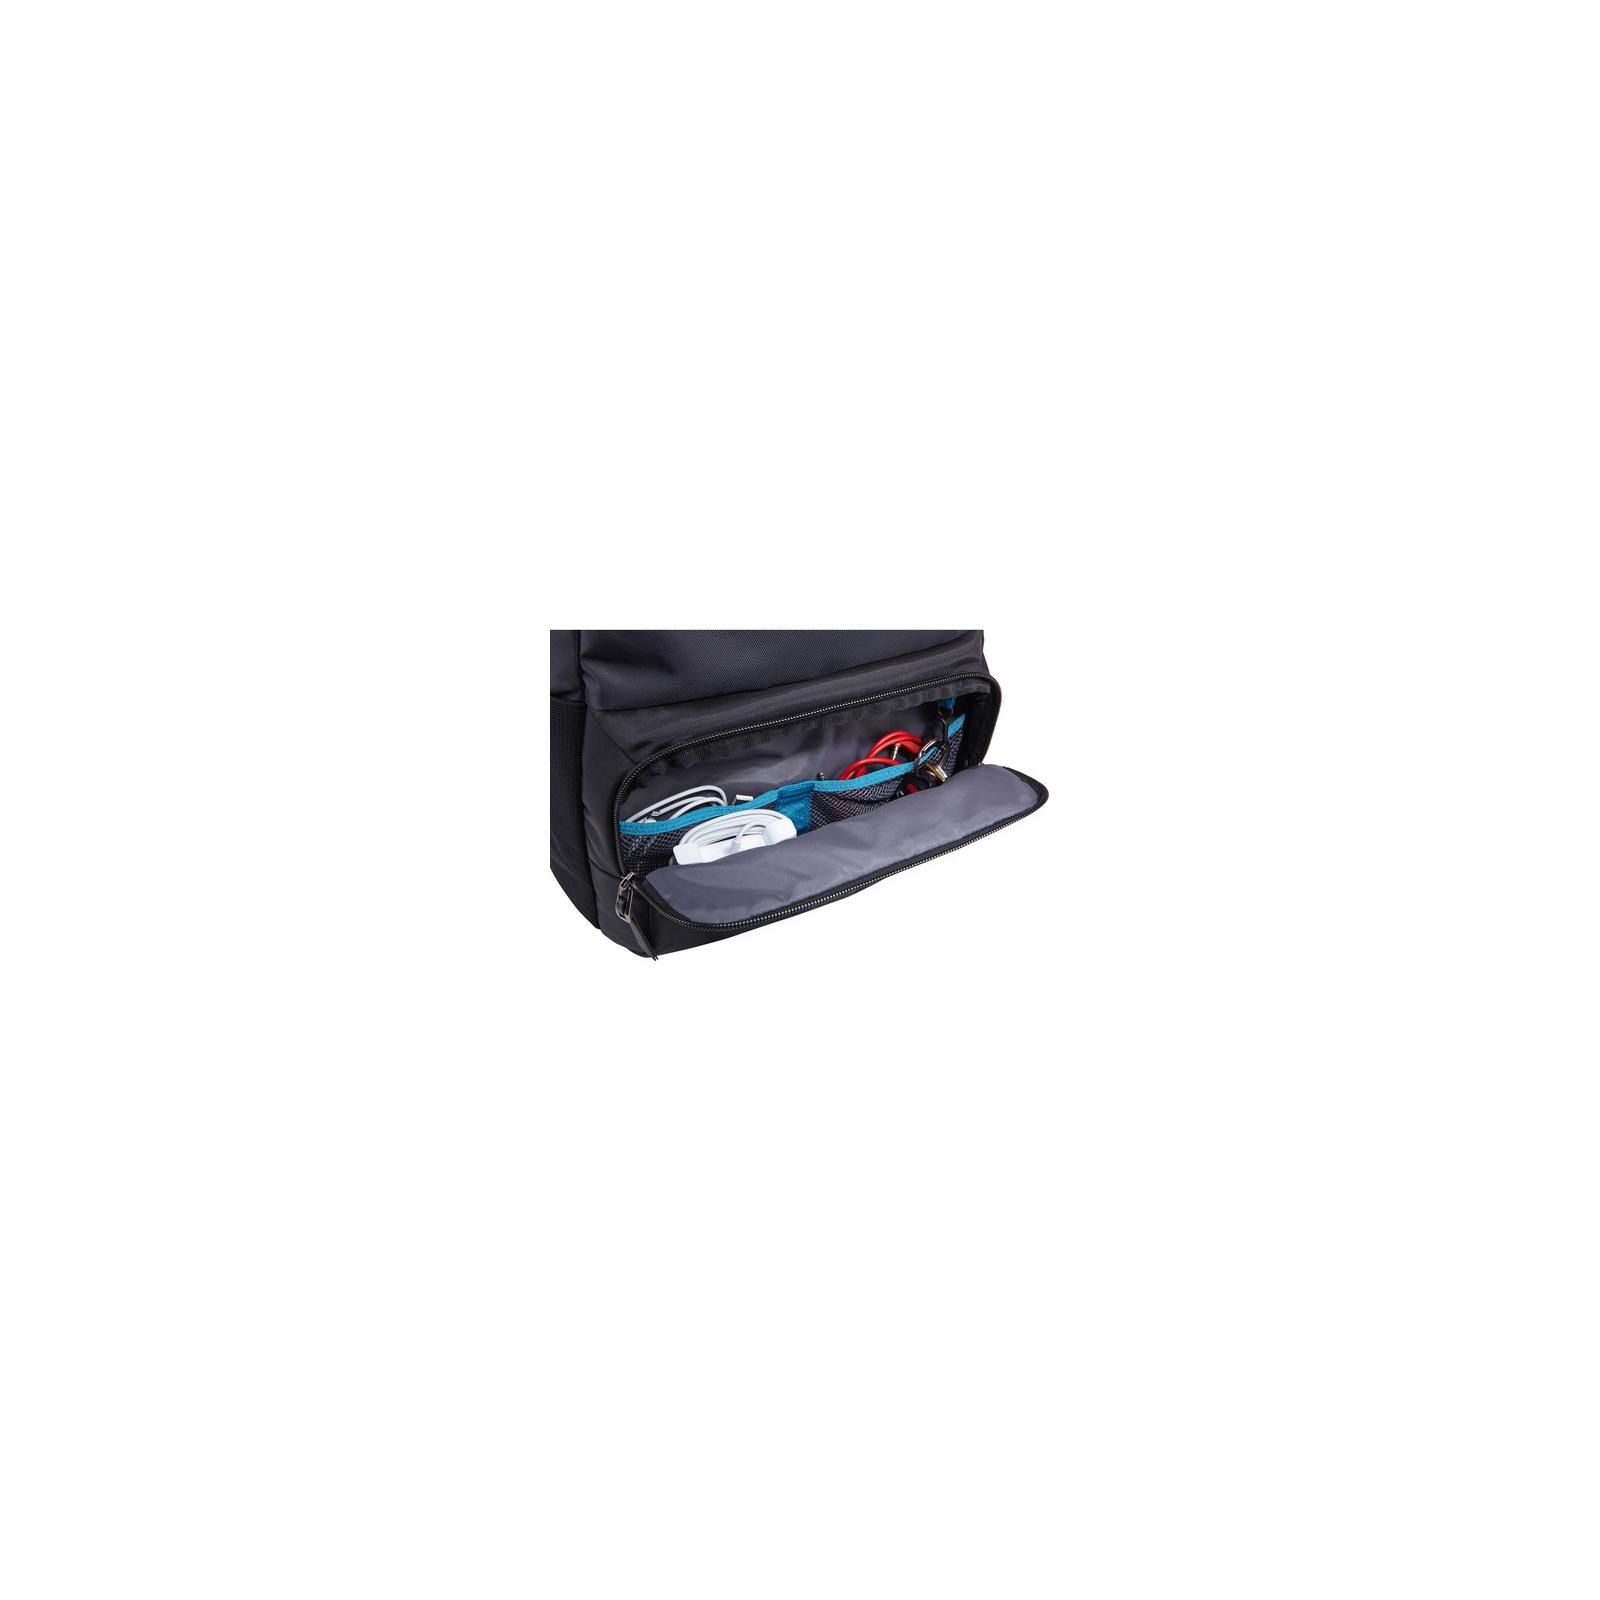 "Рюкзак для ноутбука Thule 15"" Departer 21L Corsair/Bluegrass TDMB-115 (3202905) изображение 6"